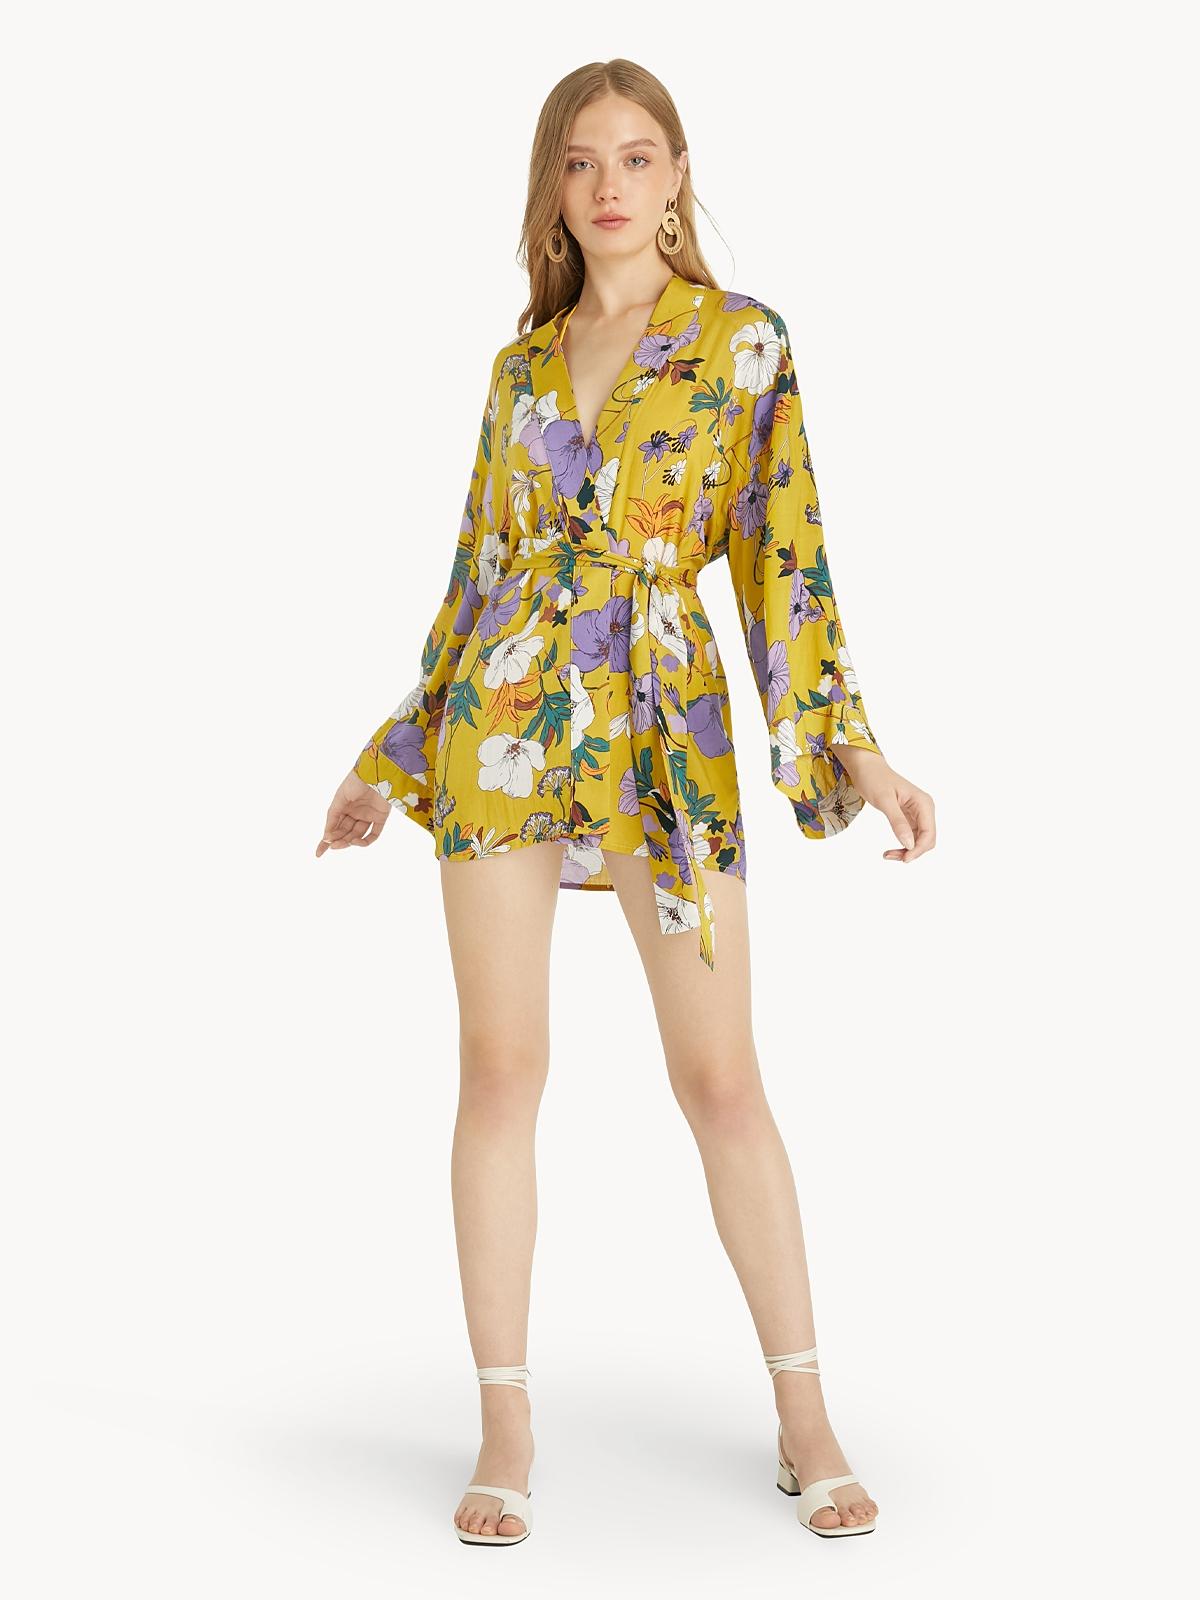 Abstract Floral Kimono Wrap Top Yellow